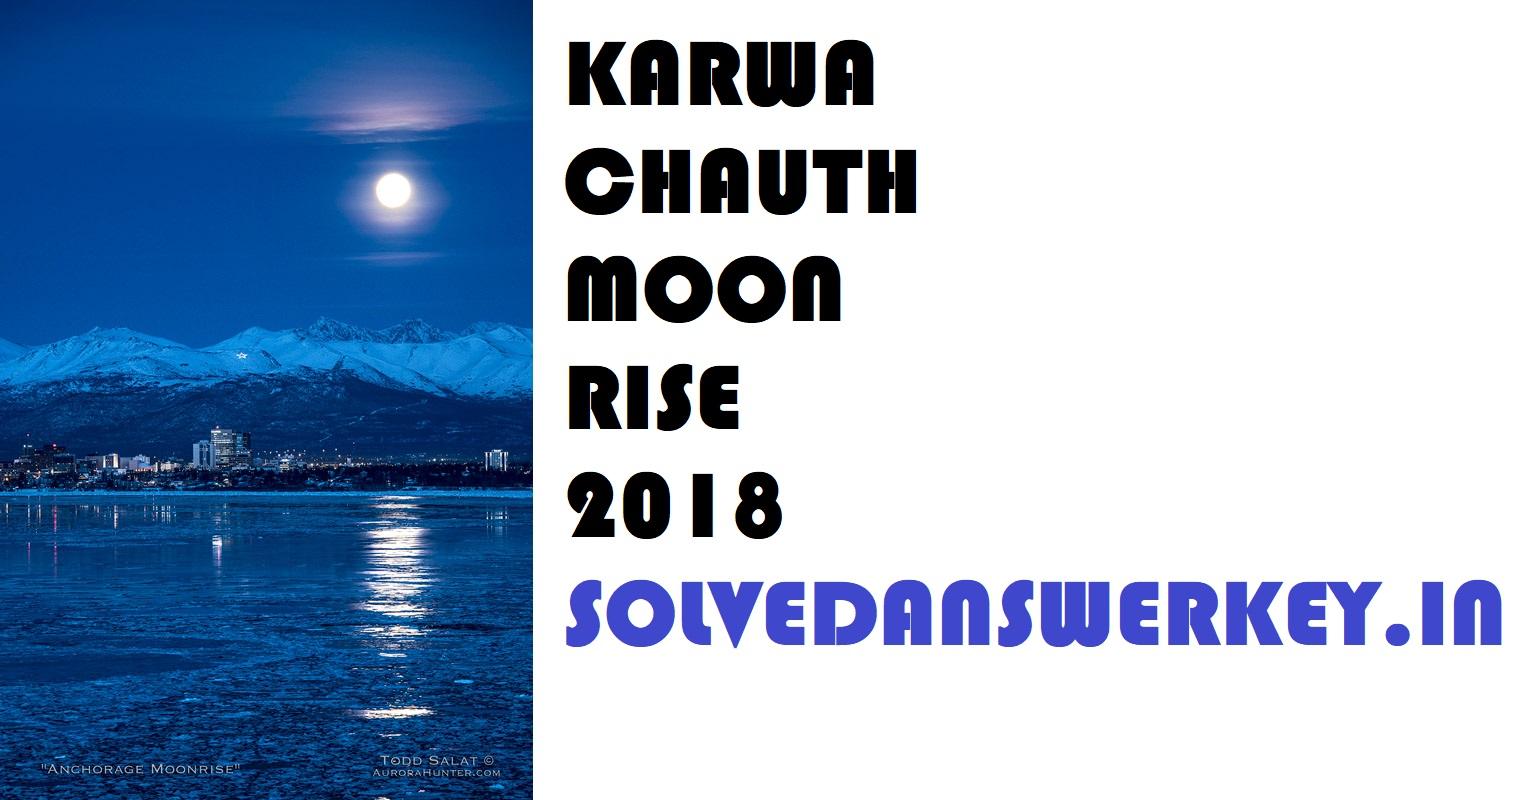 Karwa Chauth Moon Rise